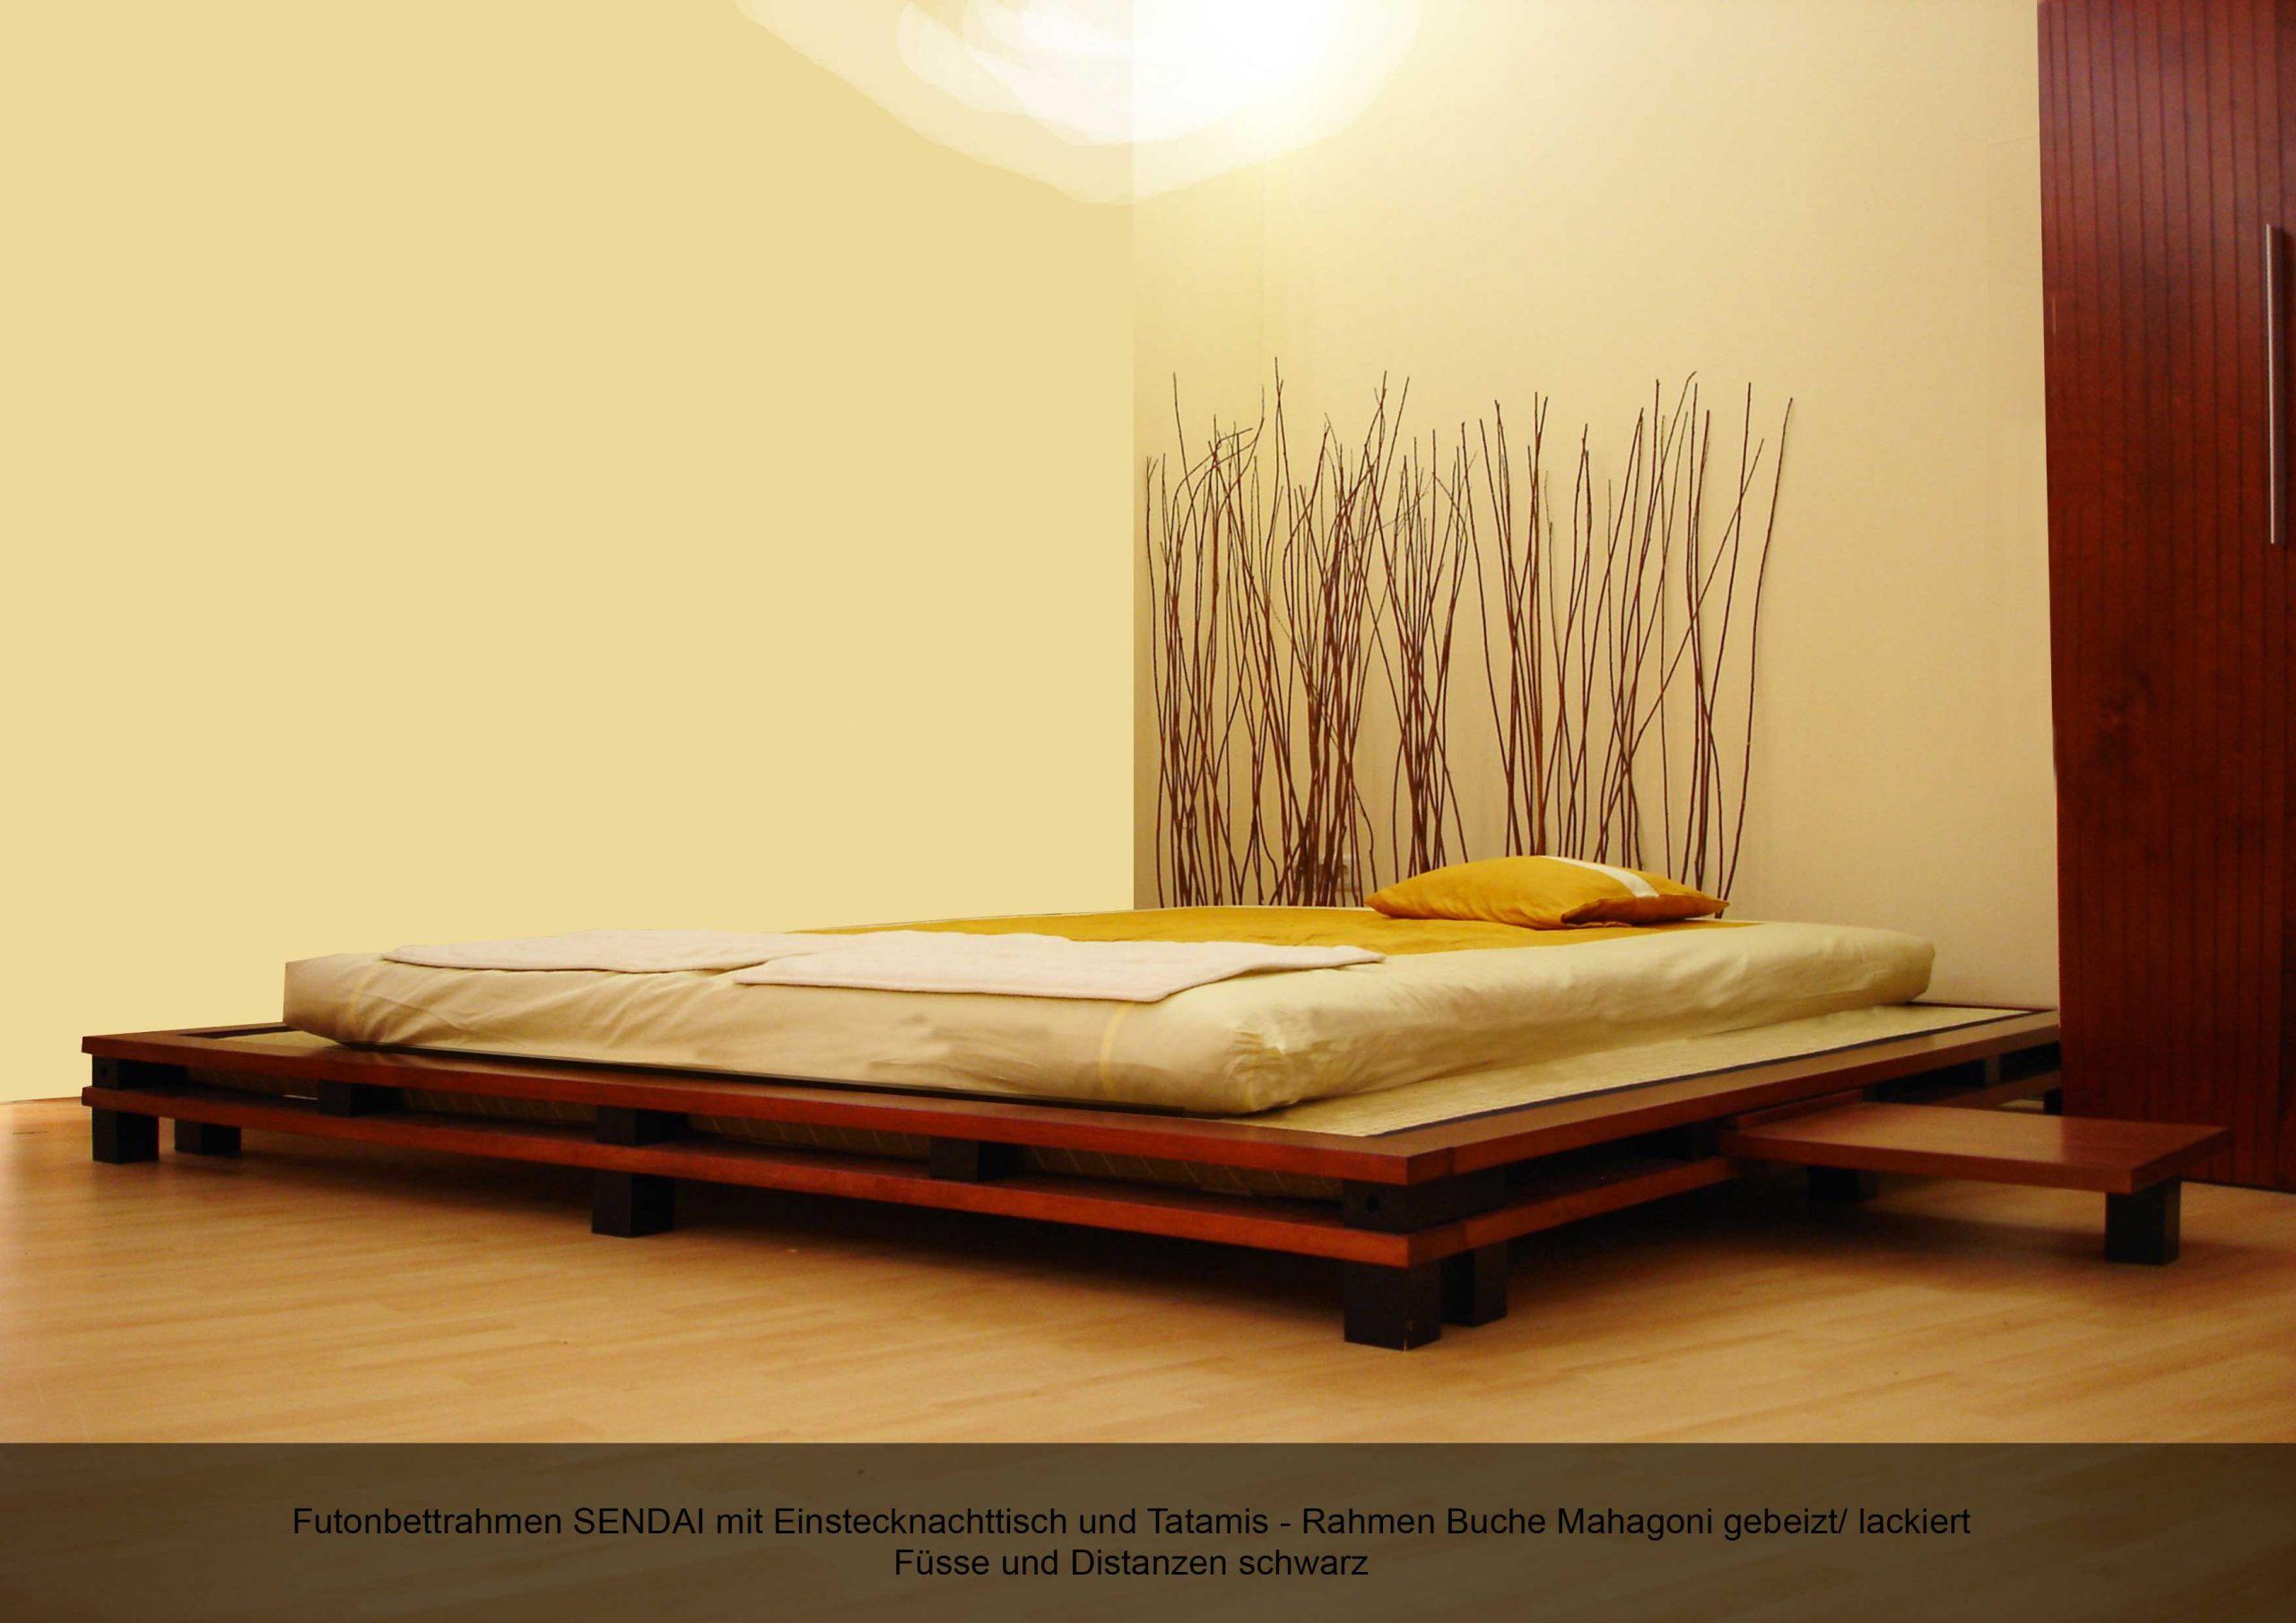 Futonbettrahmen Massivholz Einstecknachttisch SENDAI Tatamis Futon Buche Mahagoni gebeizt lackiert